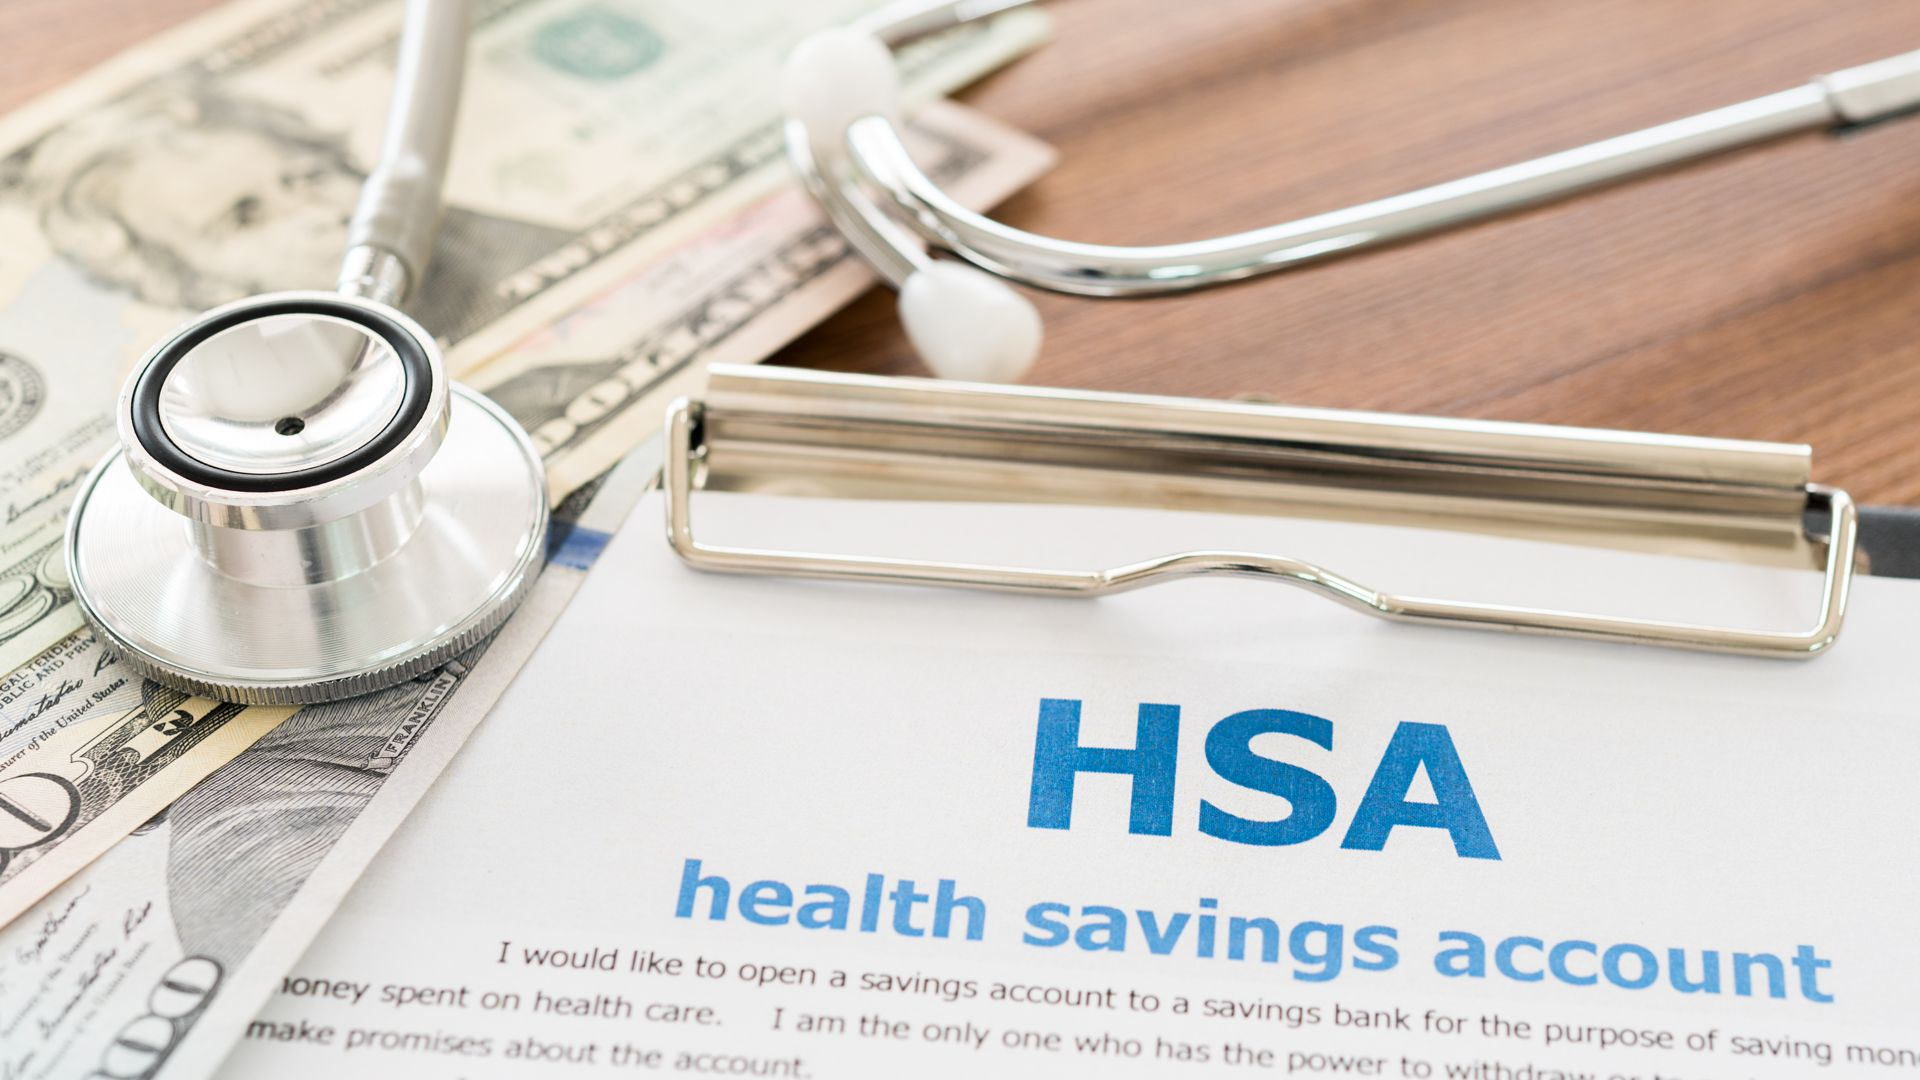 health savings account, hsa